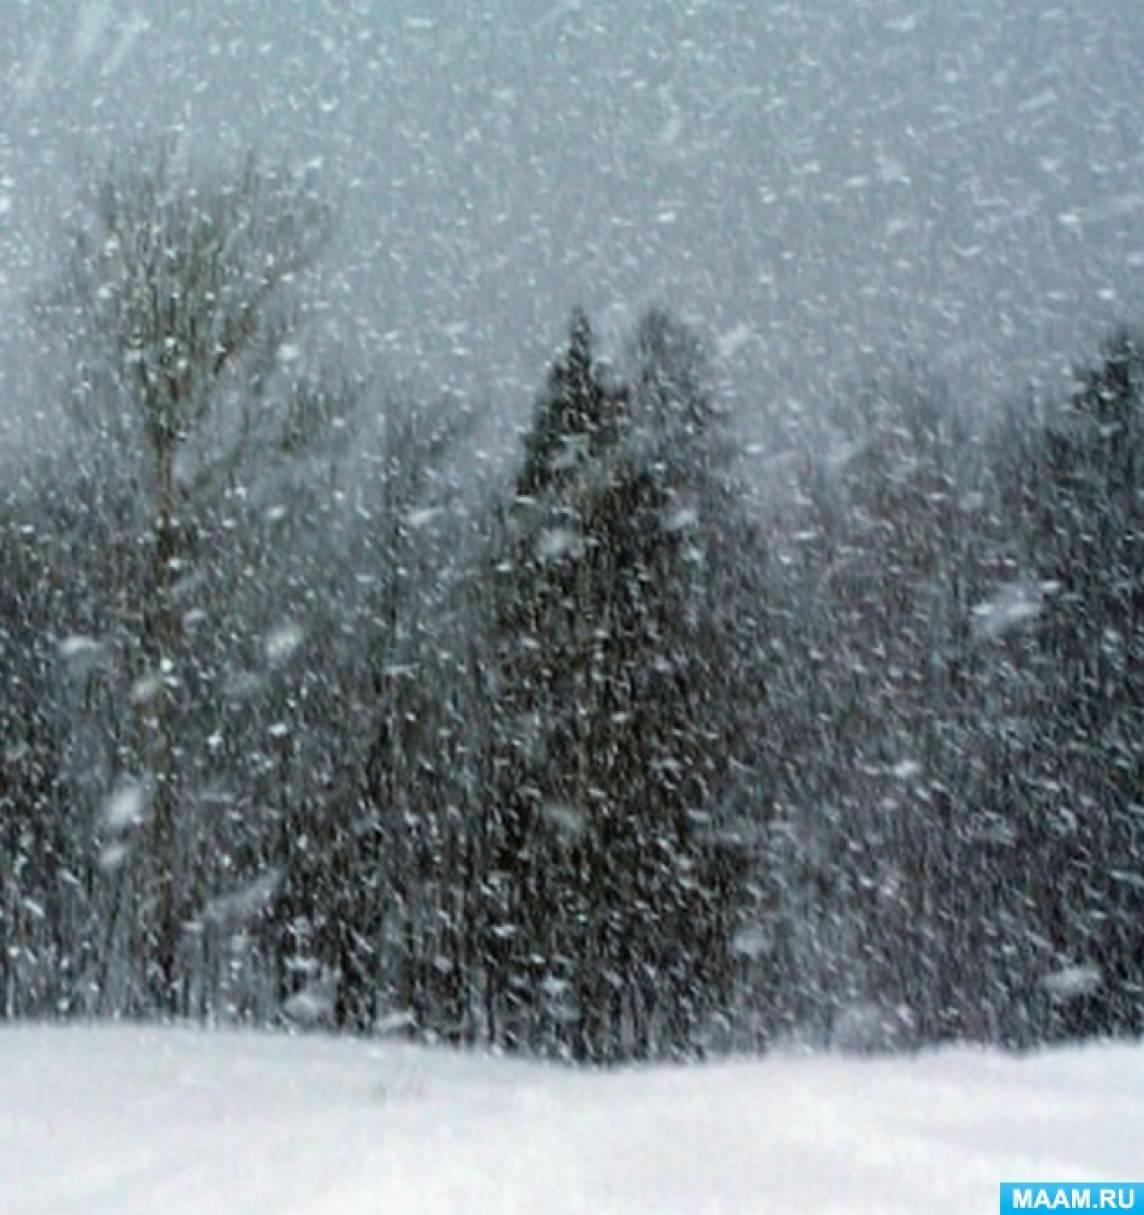 Снег на деревьях ранней осенью картинки фото